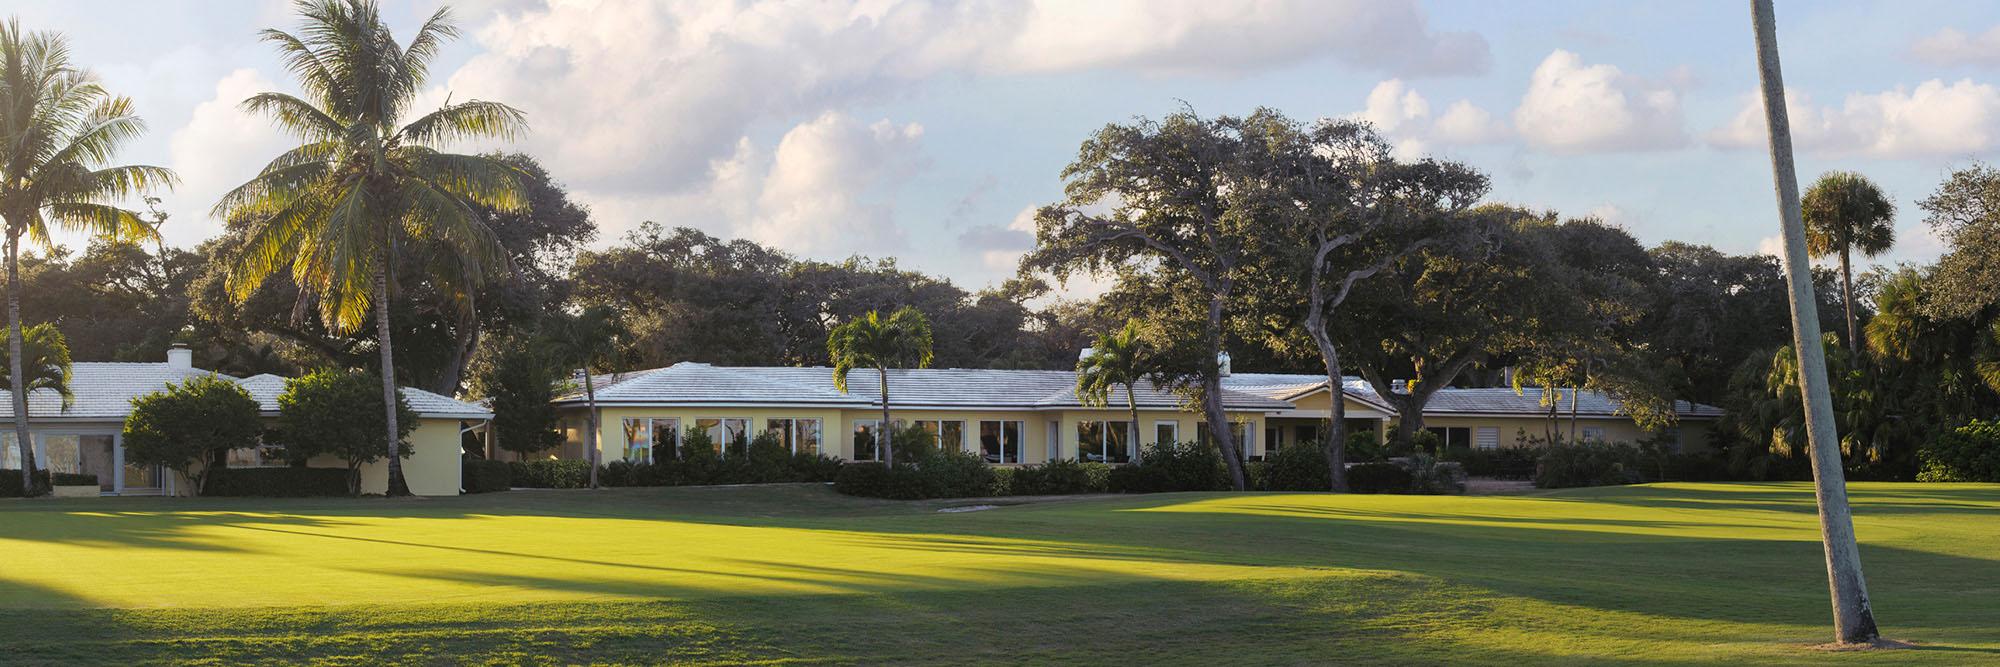 Golf Course Image - Riomar Clubhouse